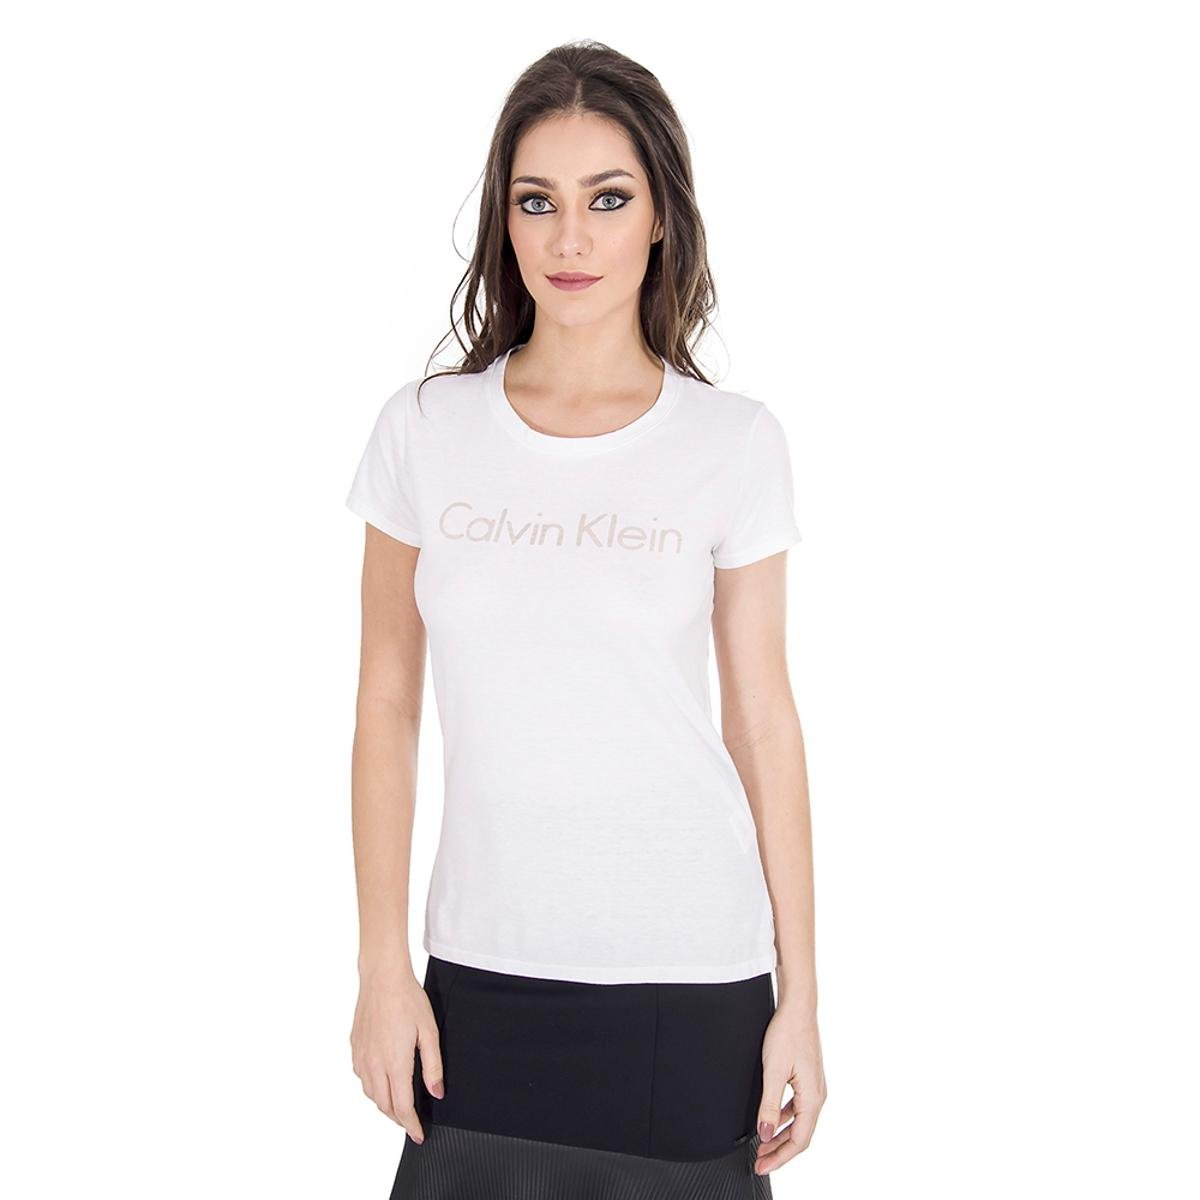 18d81e404 Camiseta Colcci Algodão Calvin Klein Feminina   Netshoes